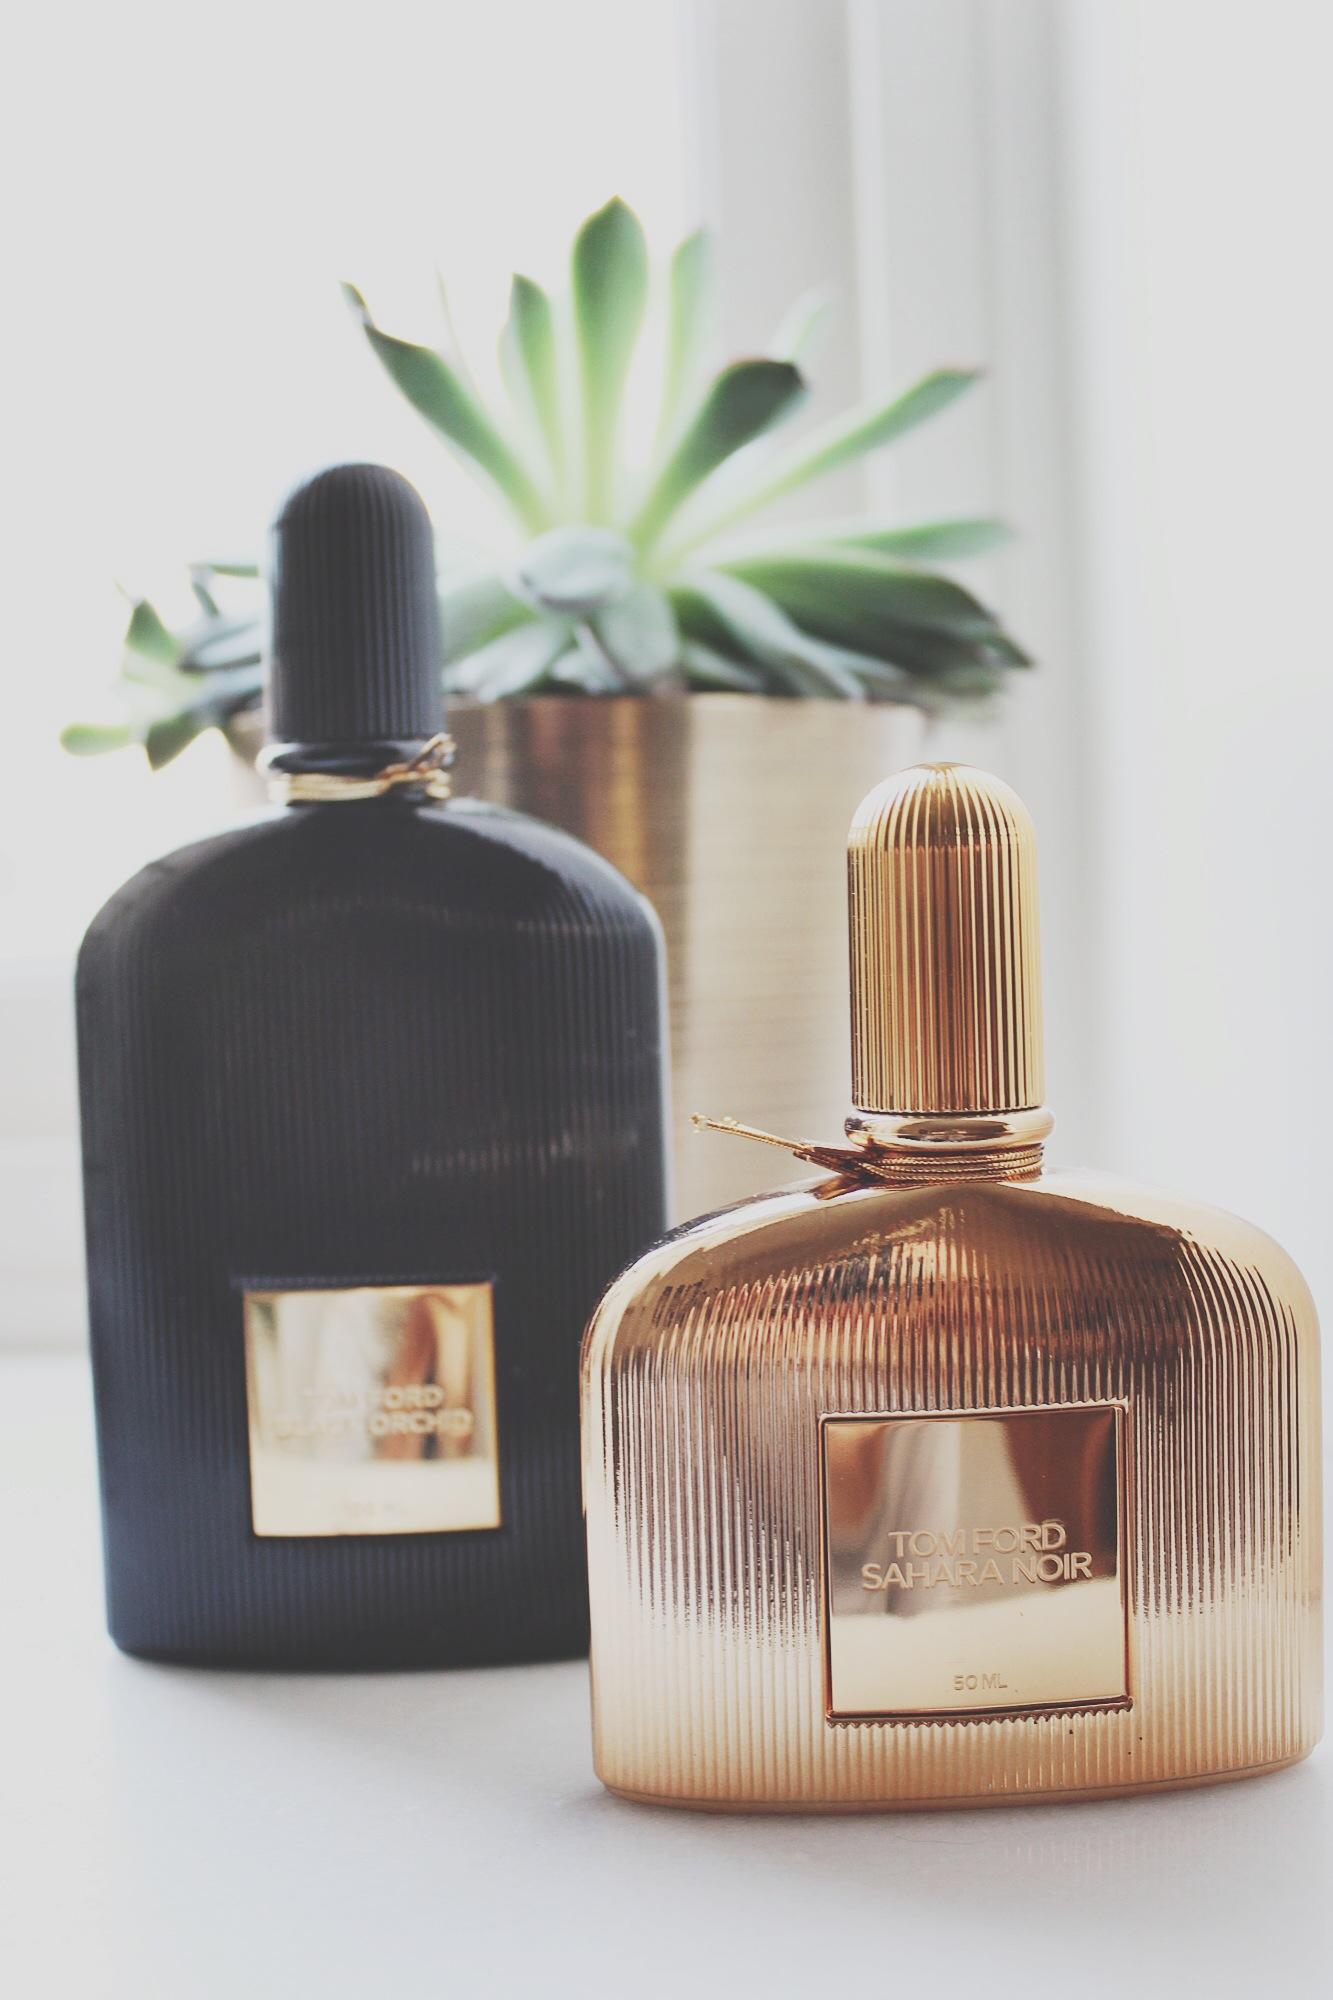 Tom Ford Black Orchid vs Sahara Noir   Do you Fika?